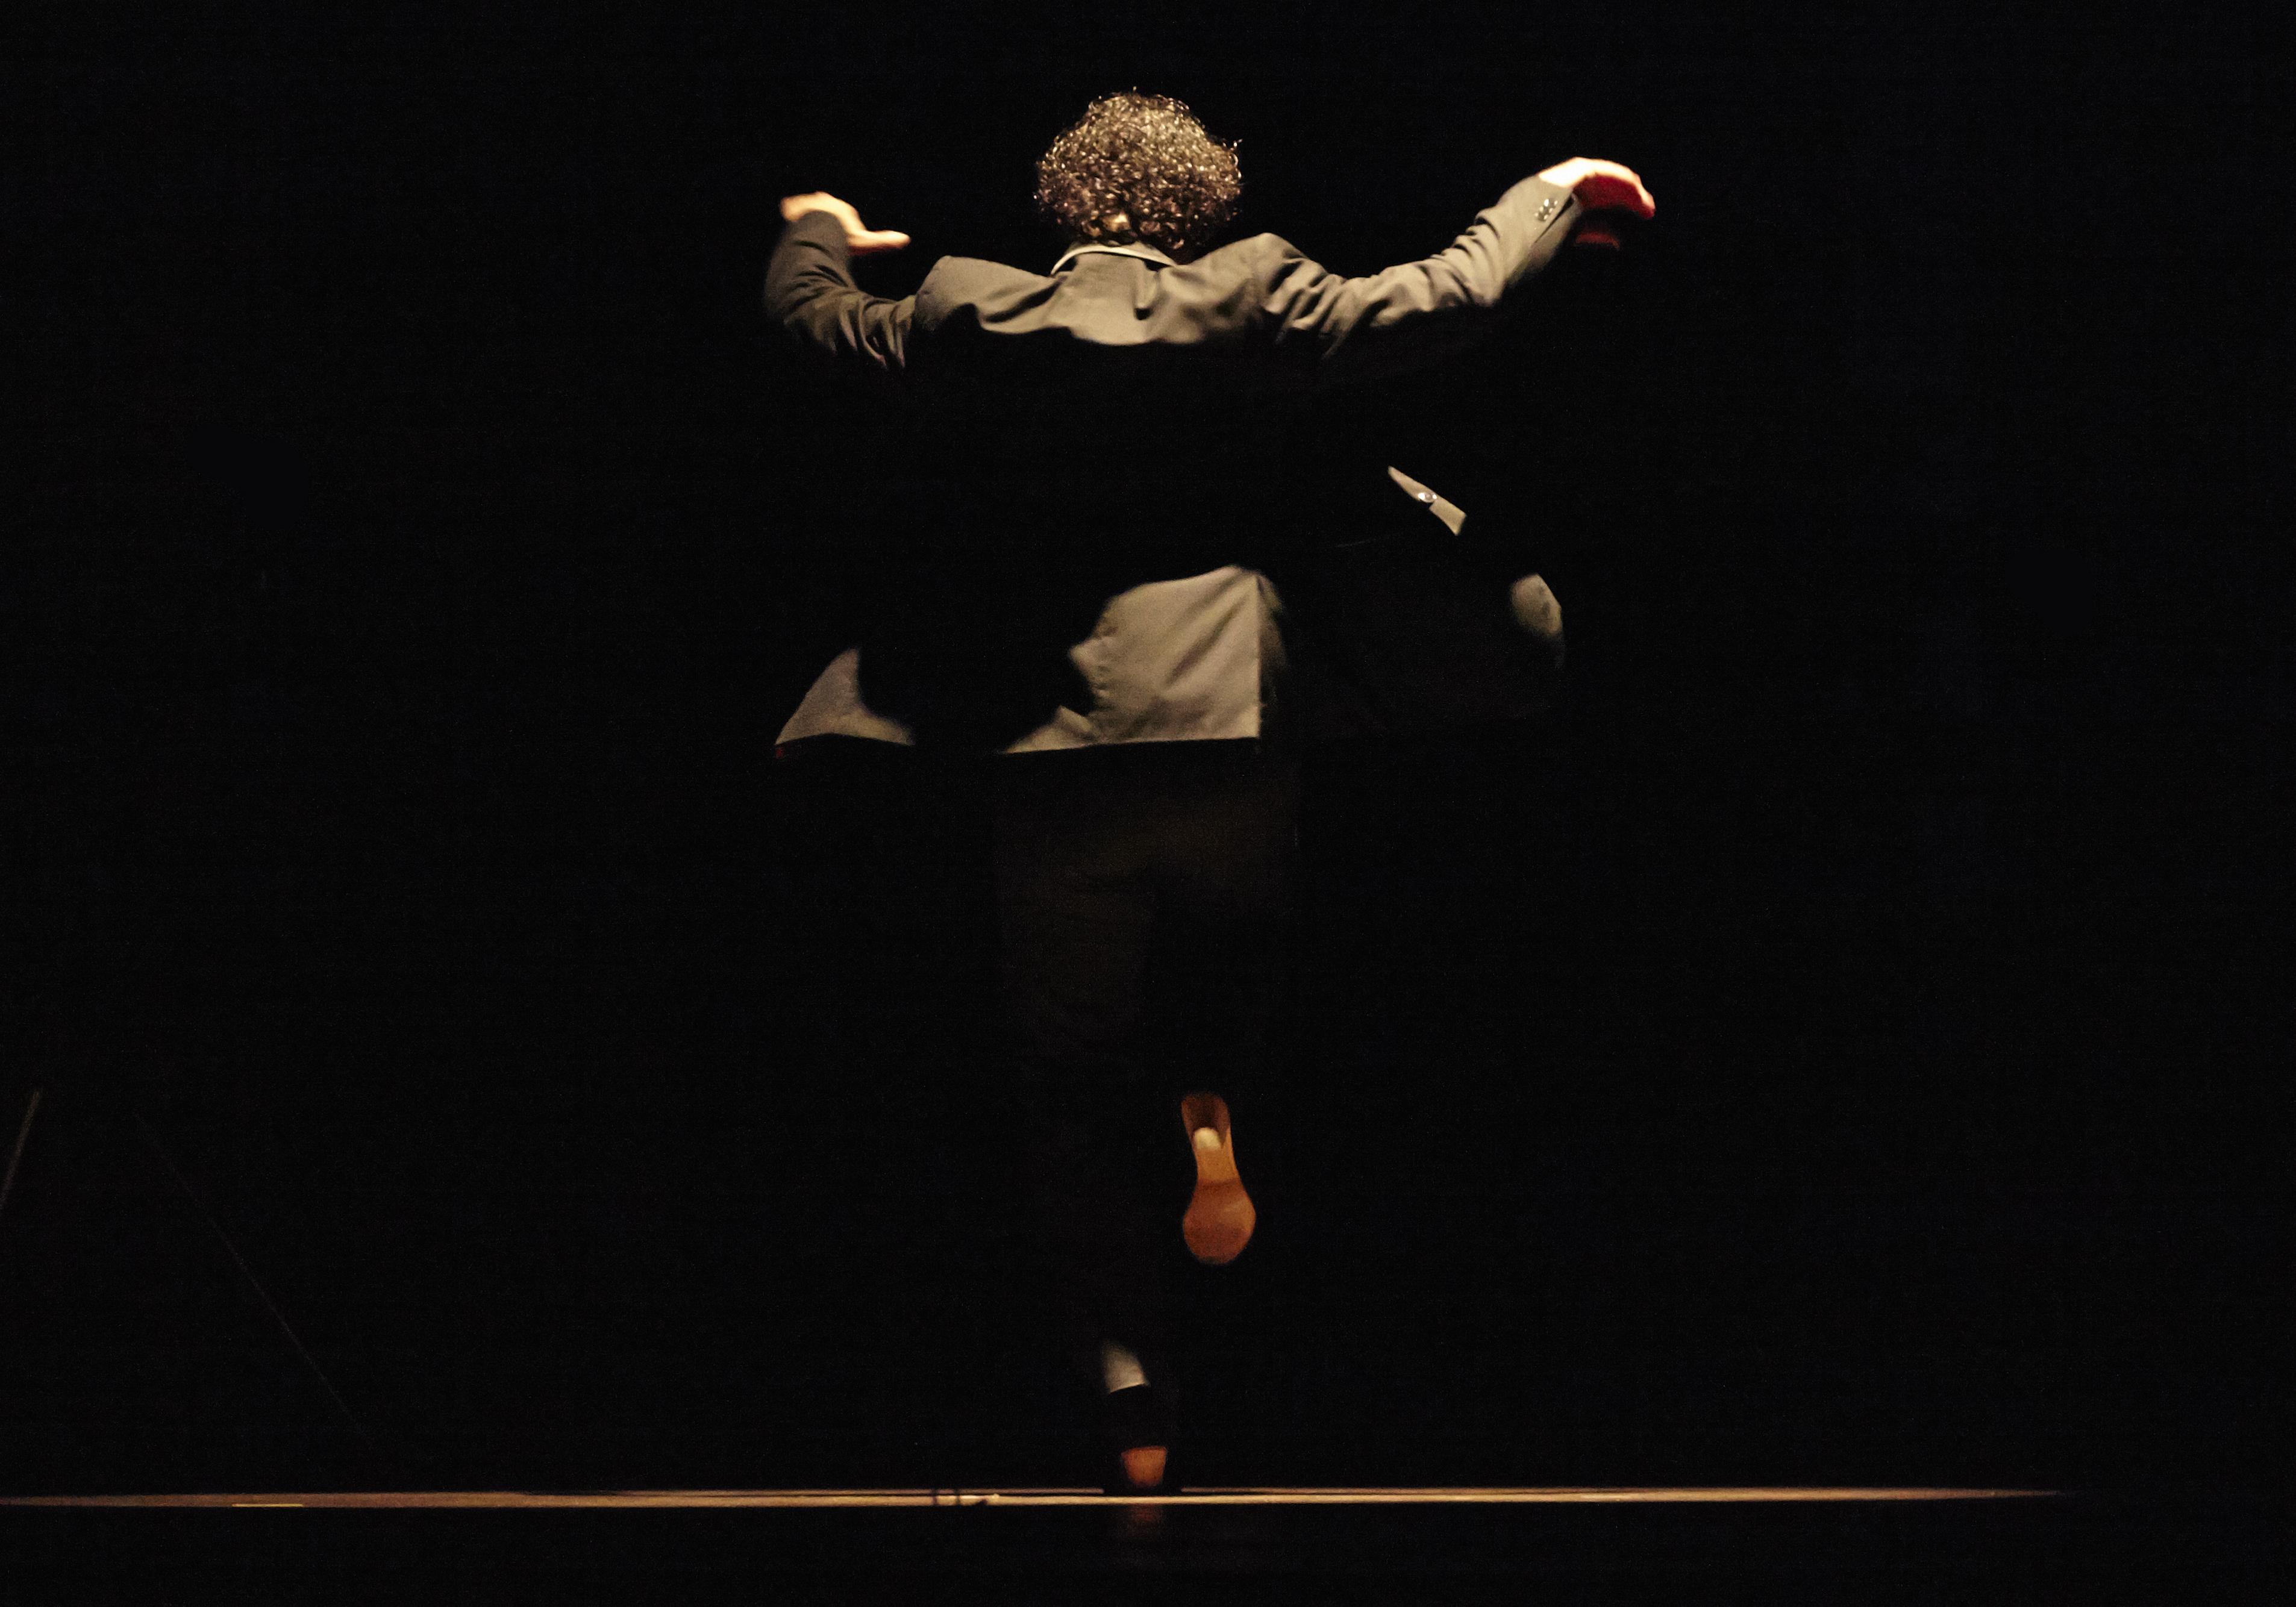 Alex angel dancing in the night 1